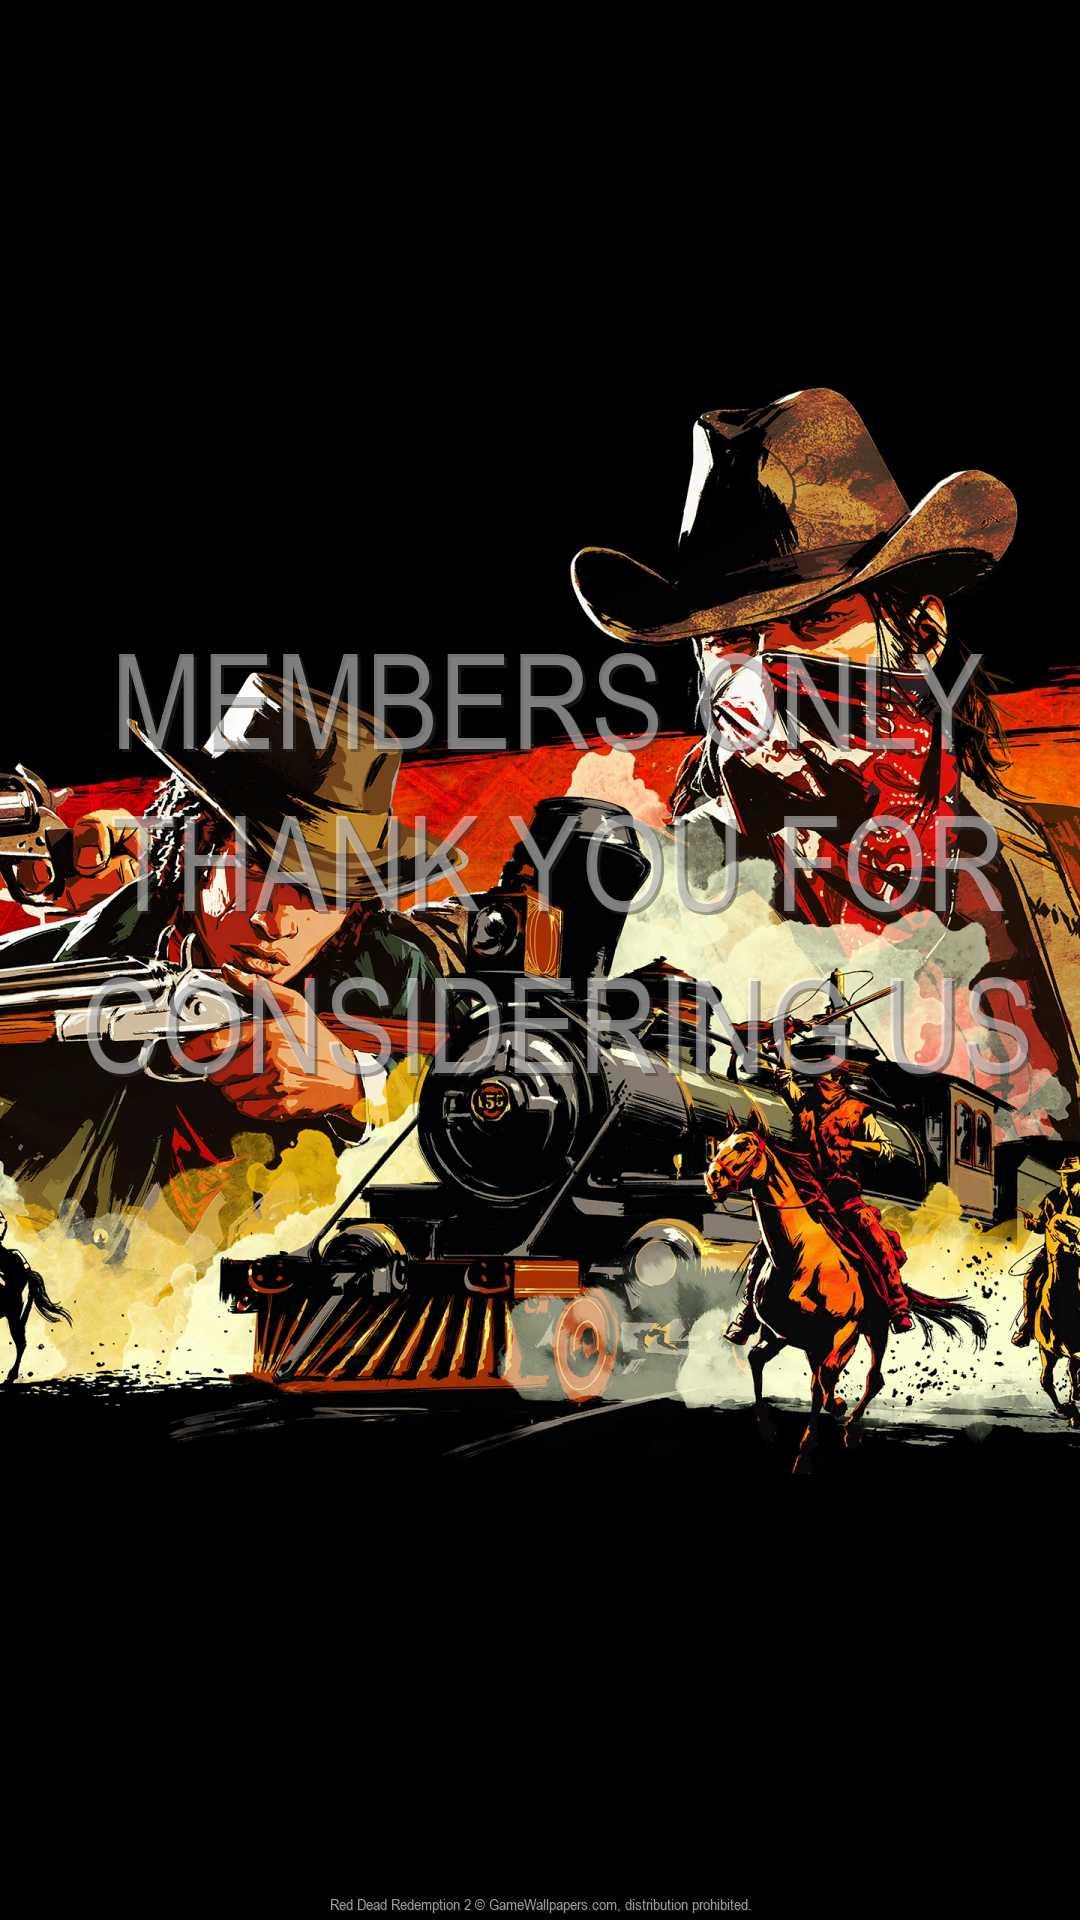 Red Dead Redemption 2 1080p Vertical Mobile wallpaper or background 08